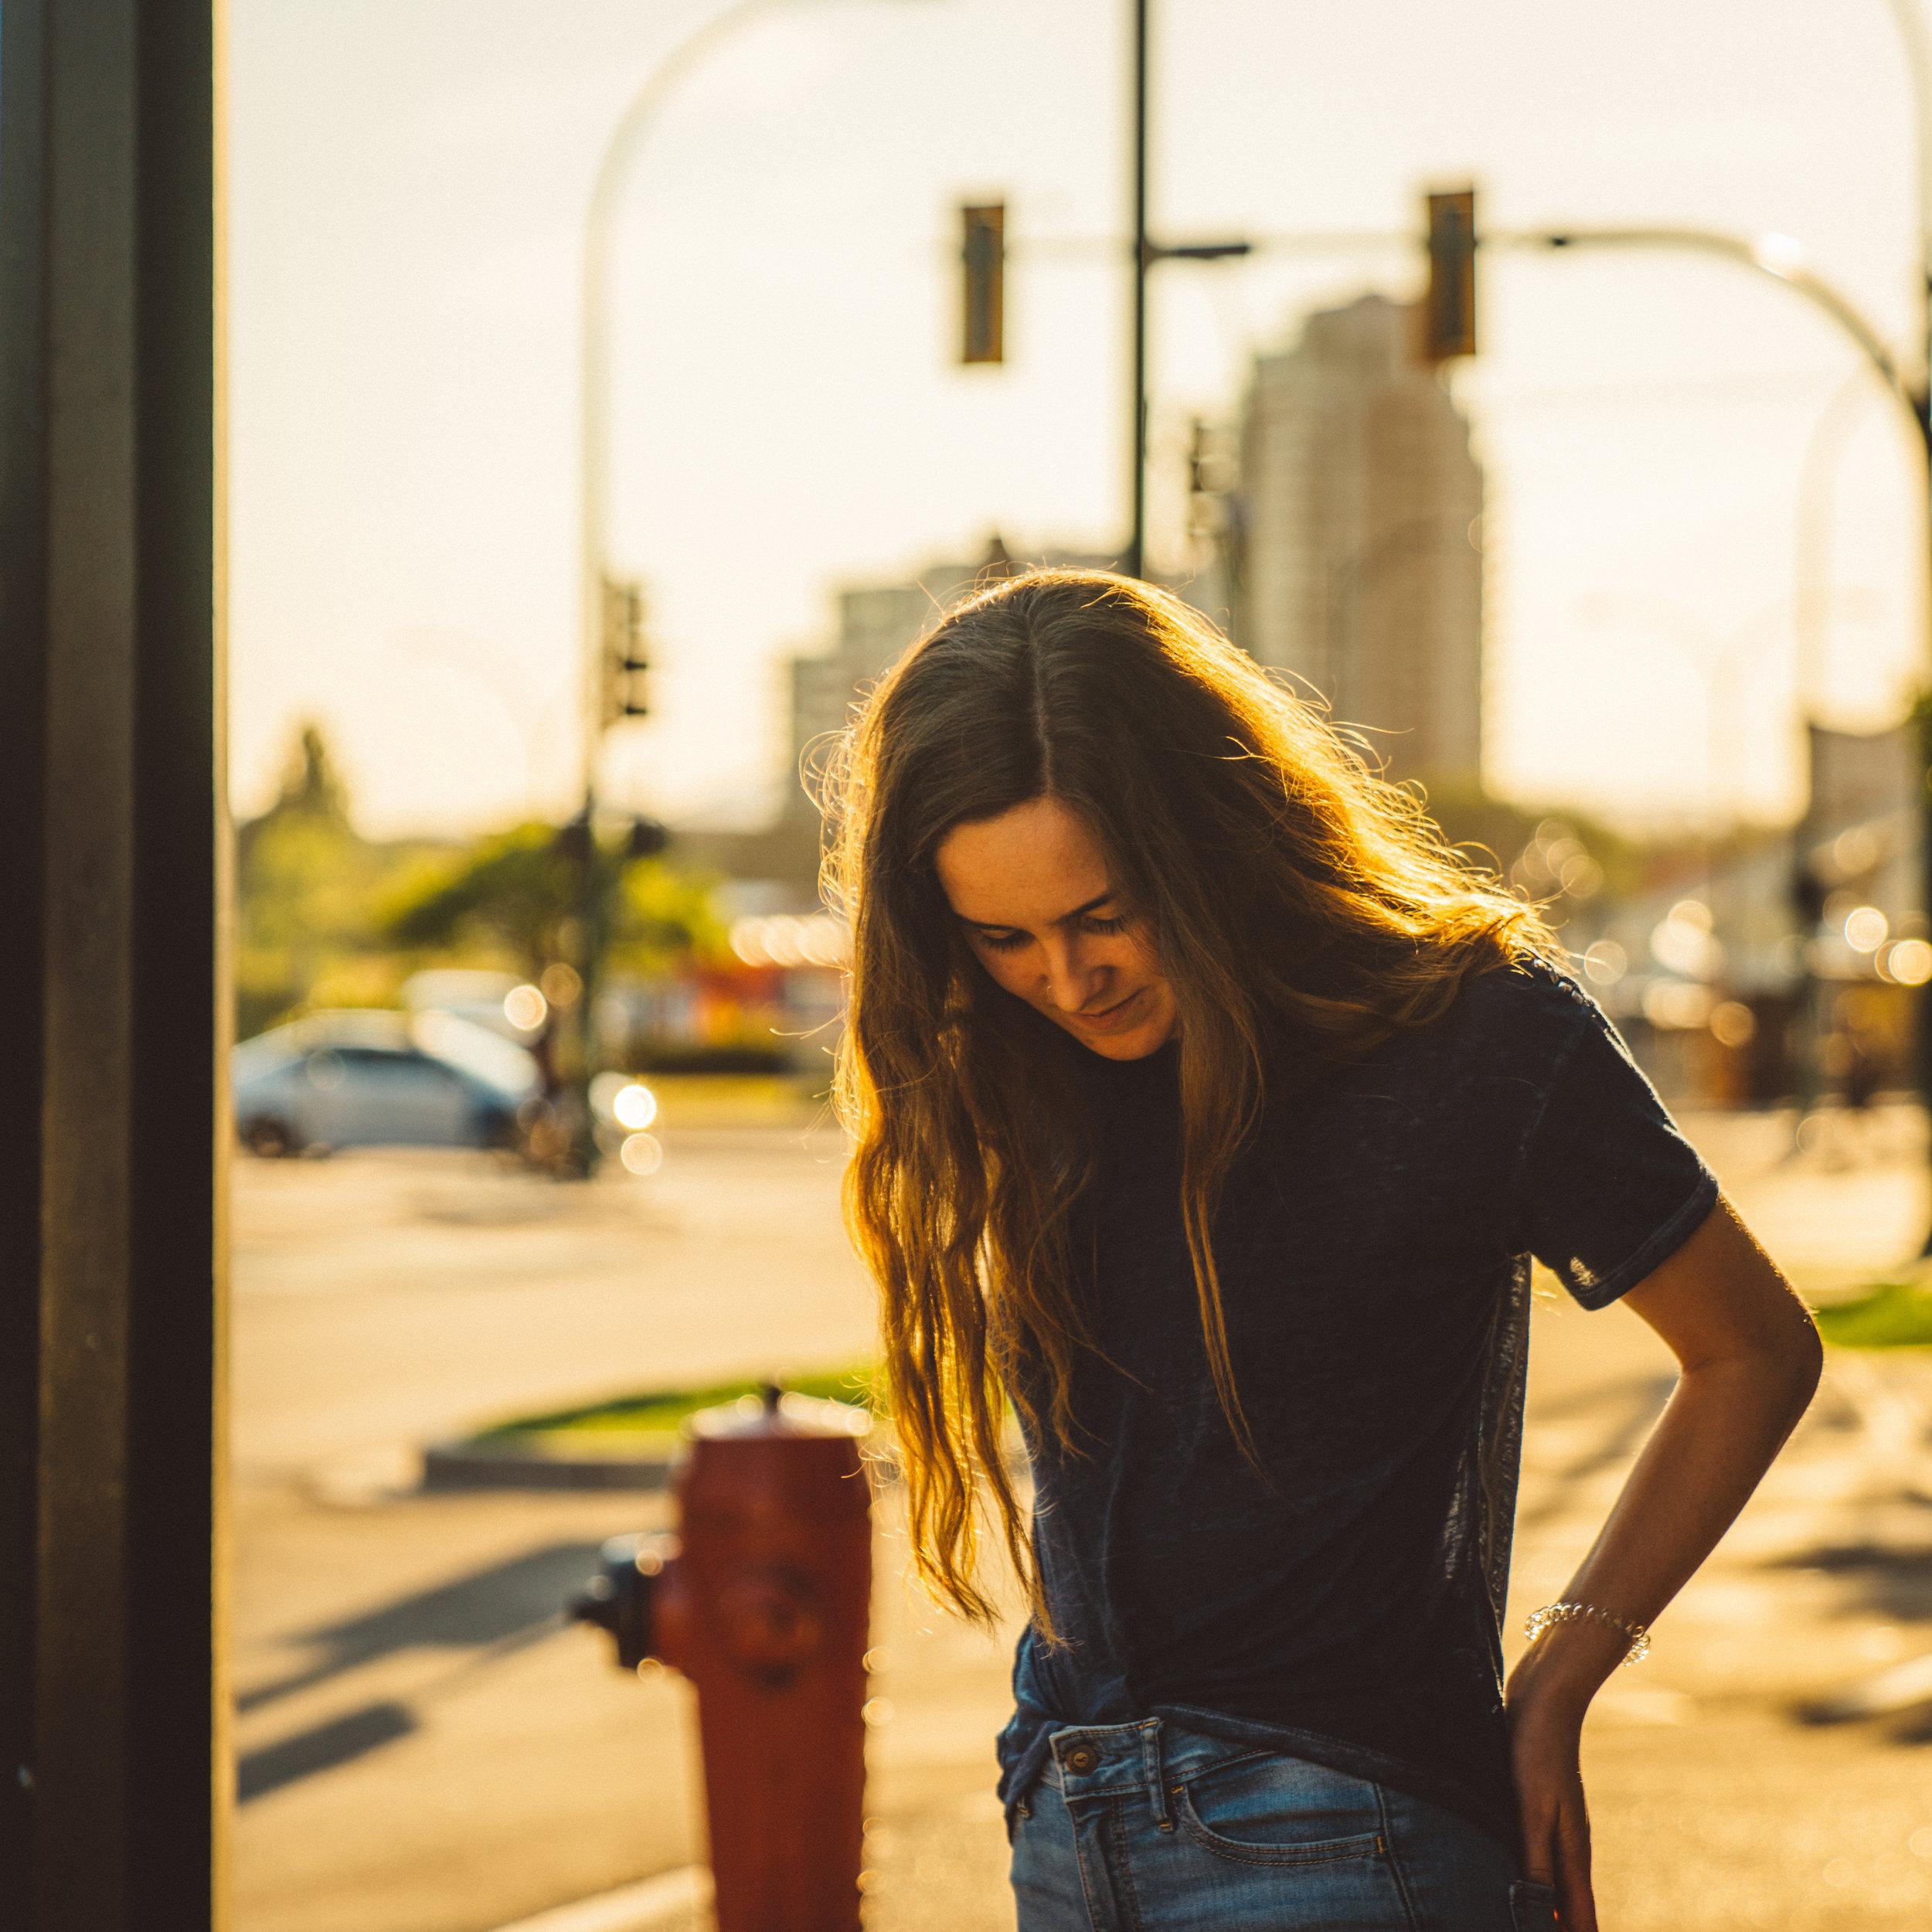 Annika on the street.